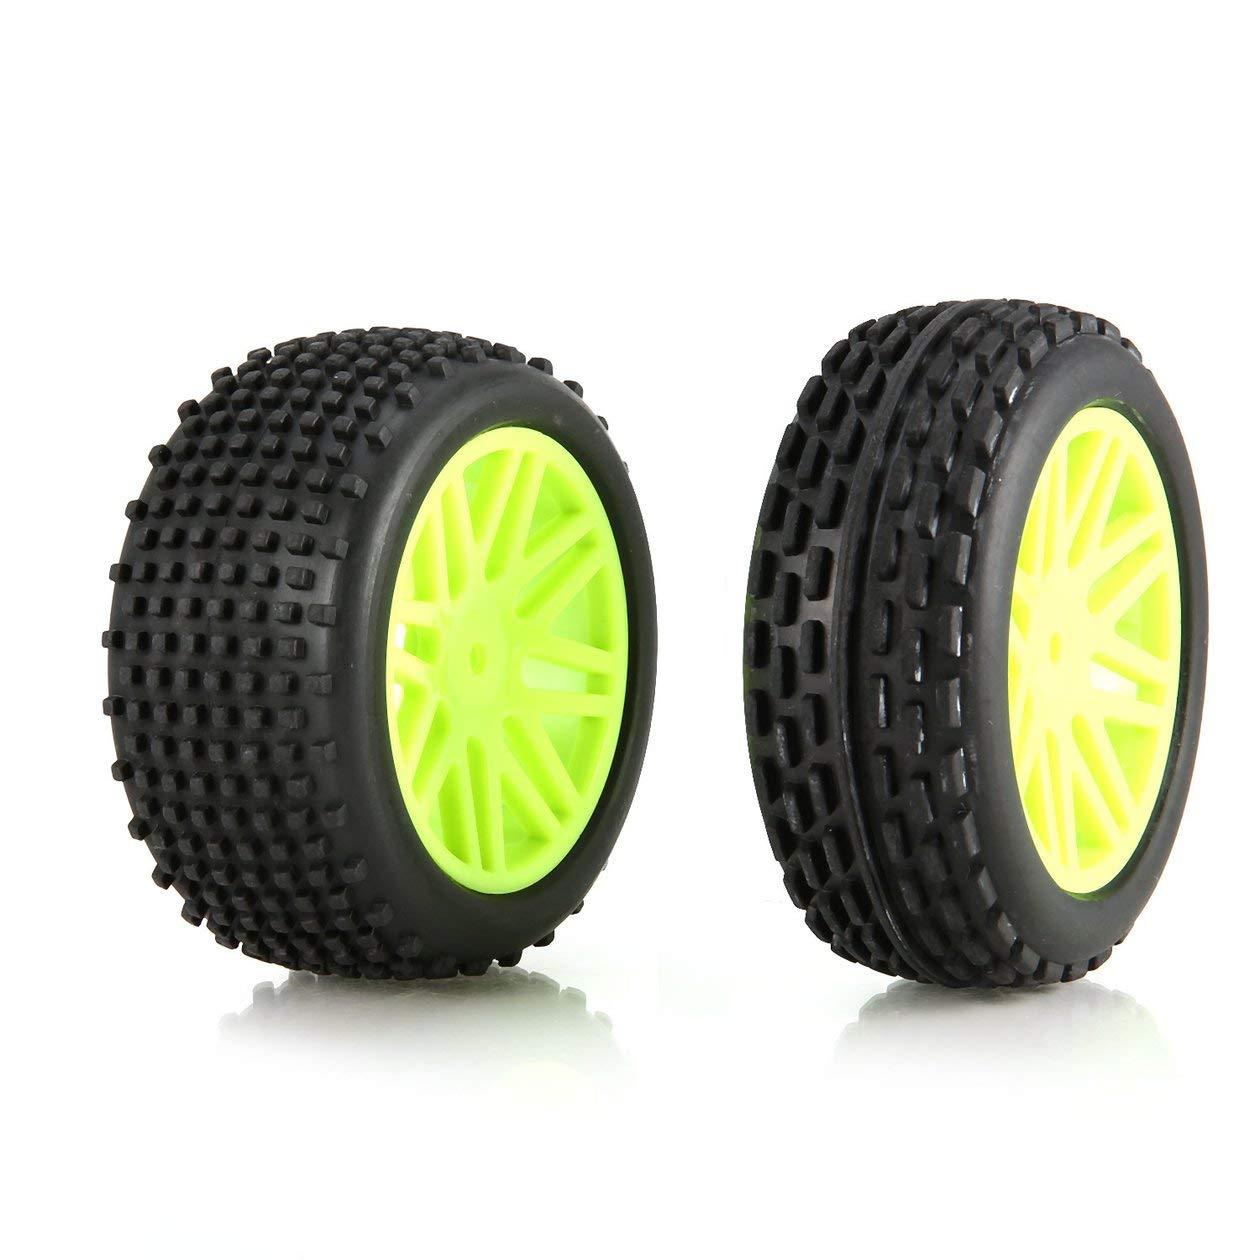 4pcs 86mm Rim Rubber Tires Tyre Wheel for 1/10 RC Crawler Car Model